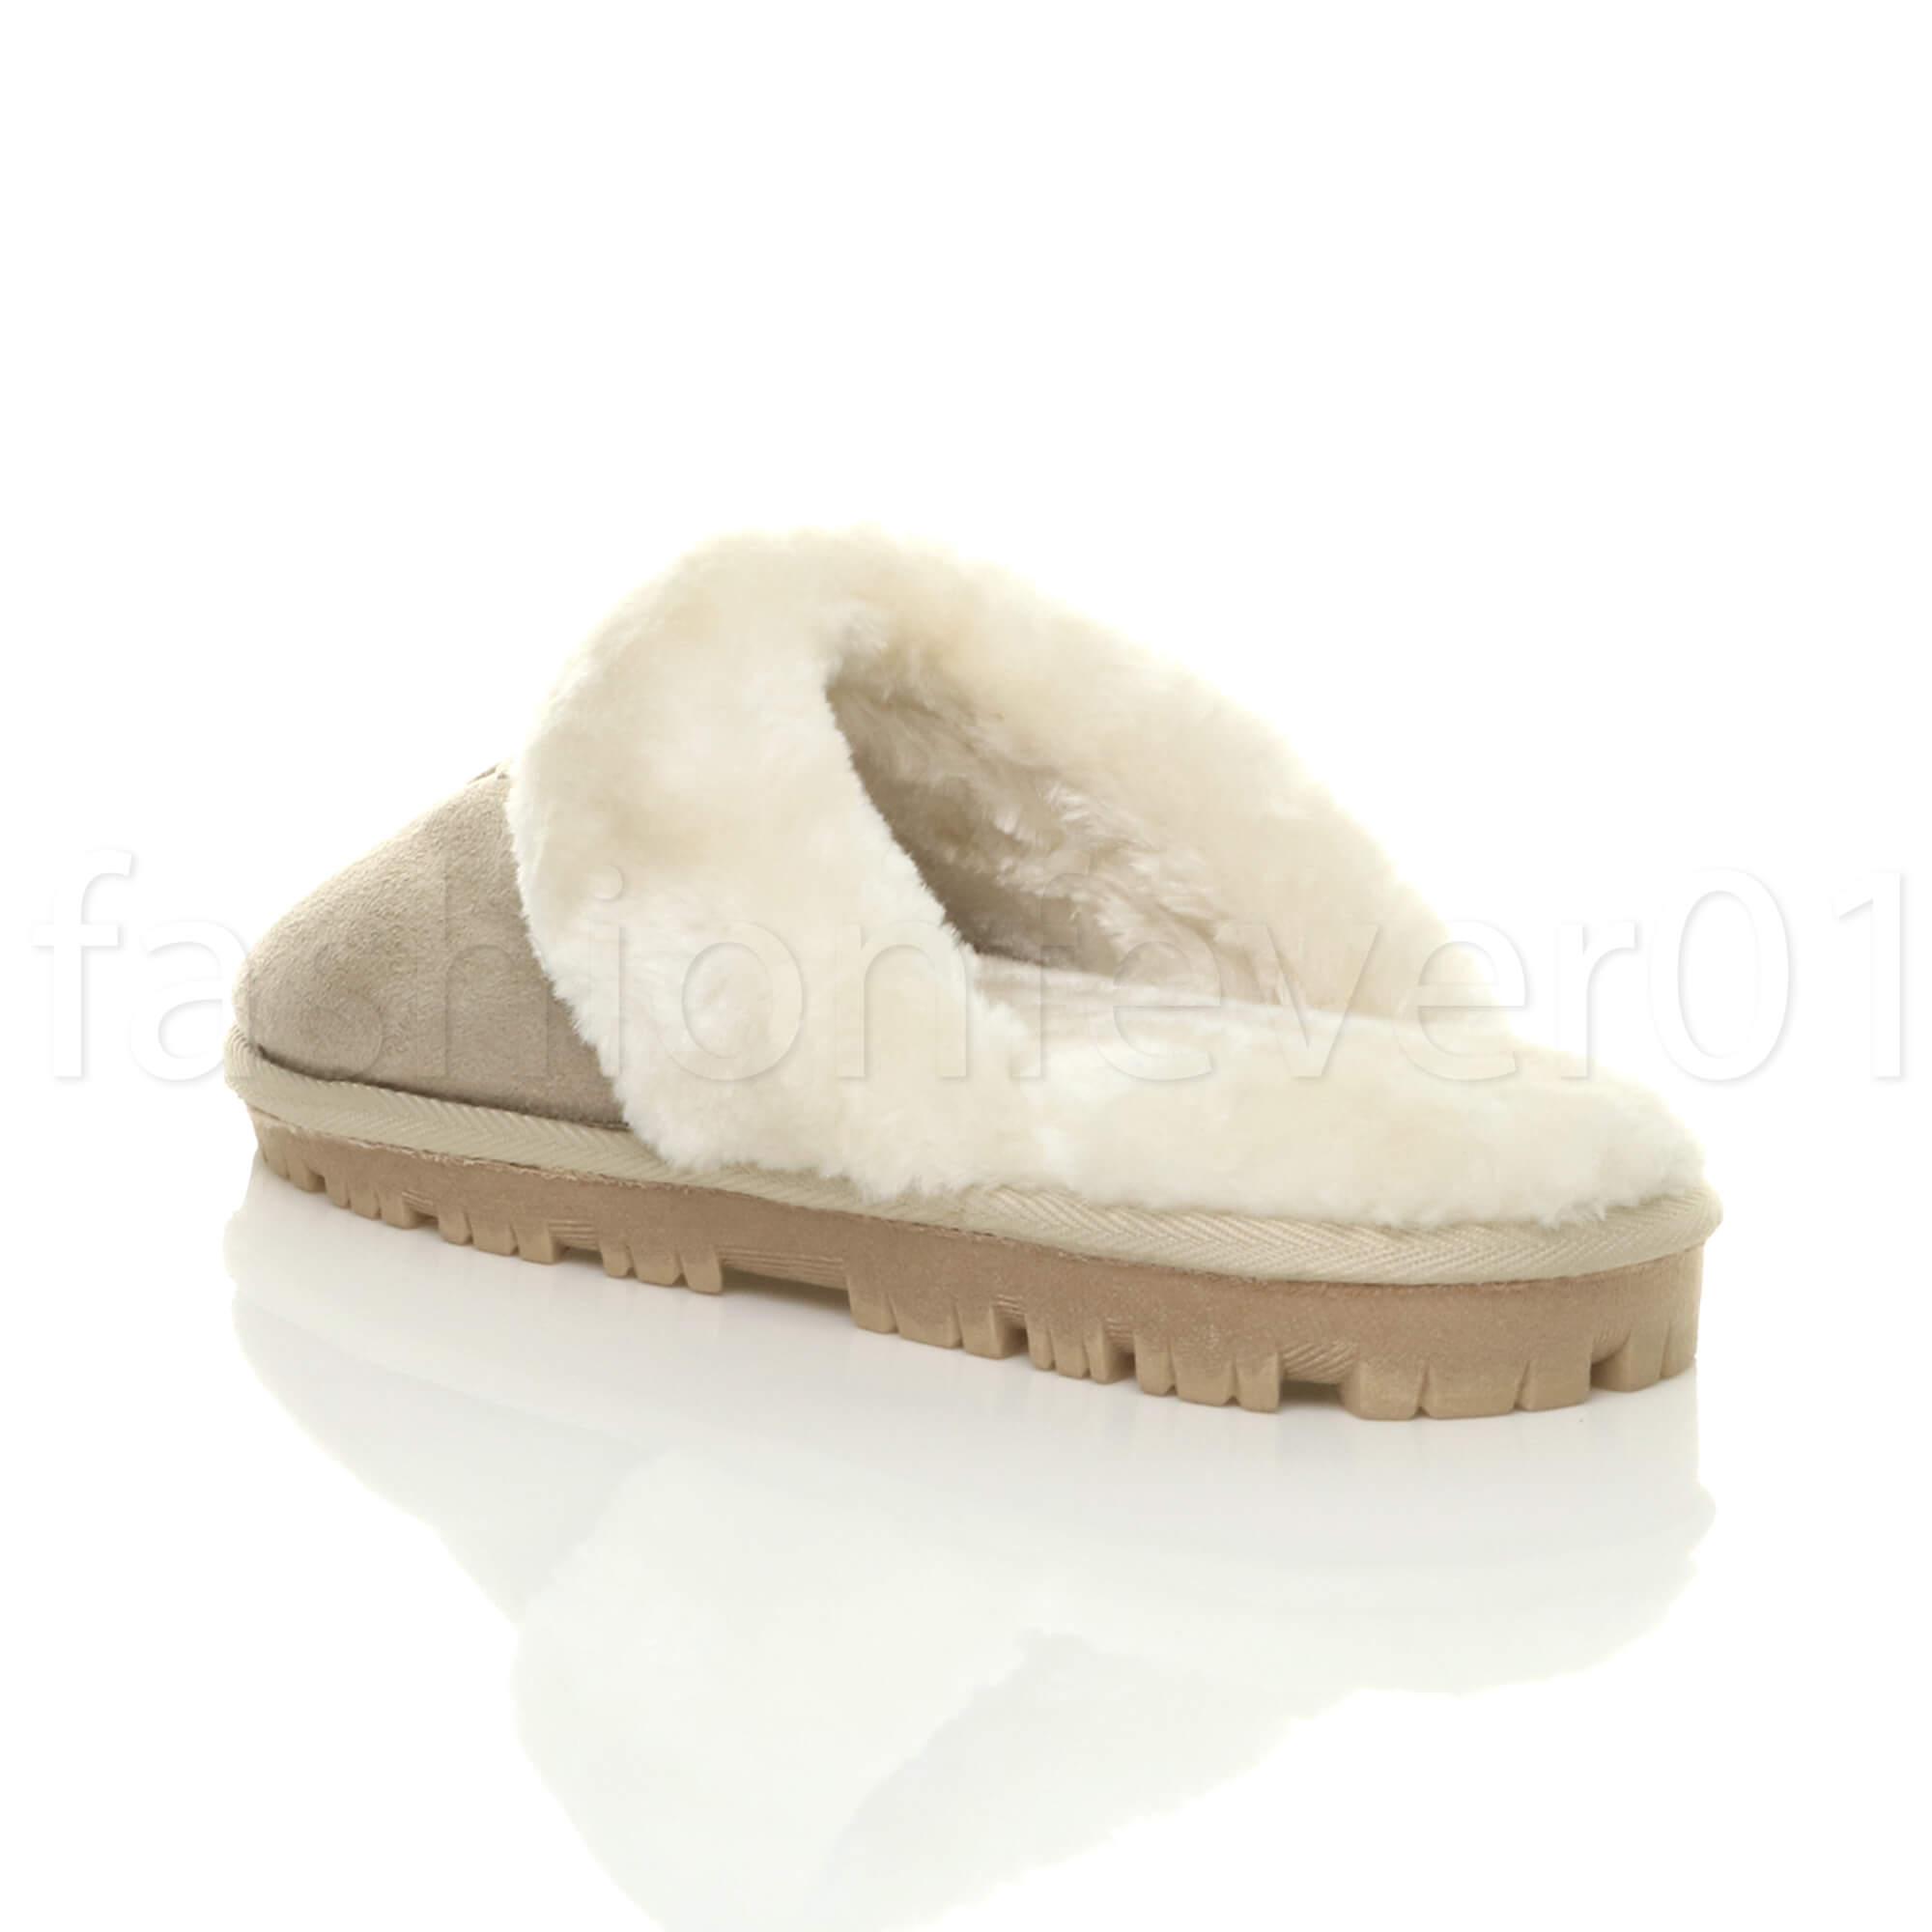 Womens Ladies Winter Fur Lined Luxury Comfortable Gift Snug Slipper Sizes 3-8 UK